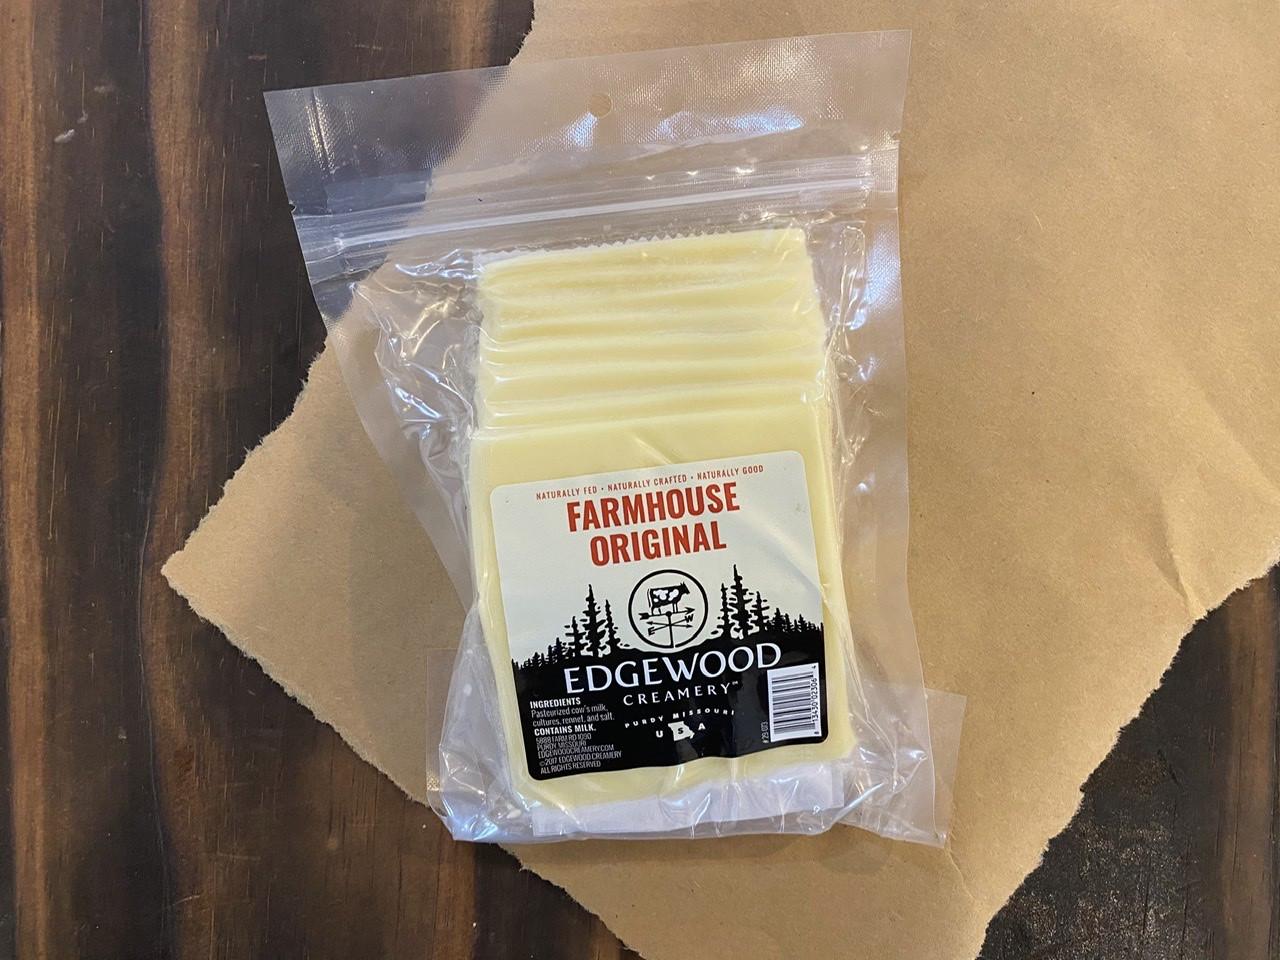 Farmhouse Sliced Cheese